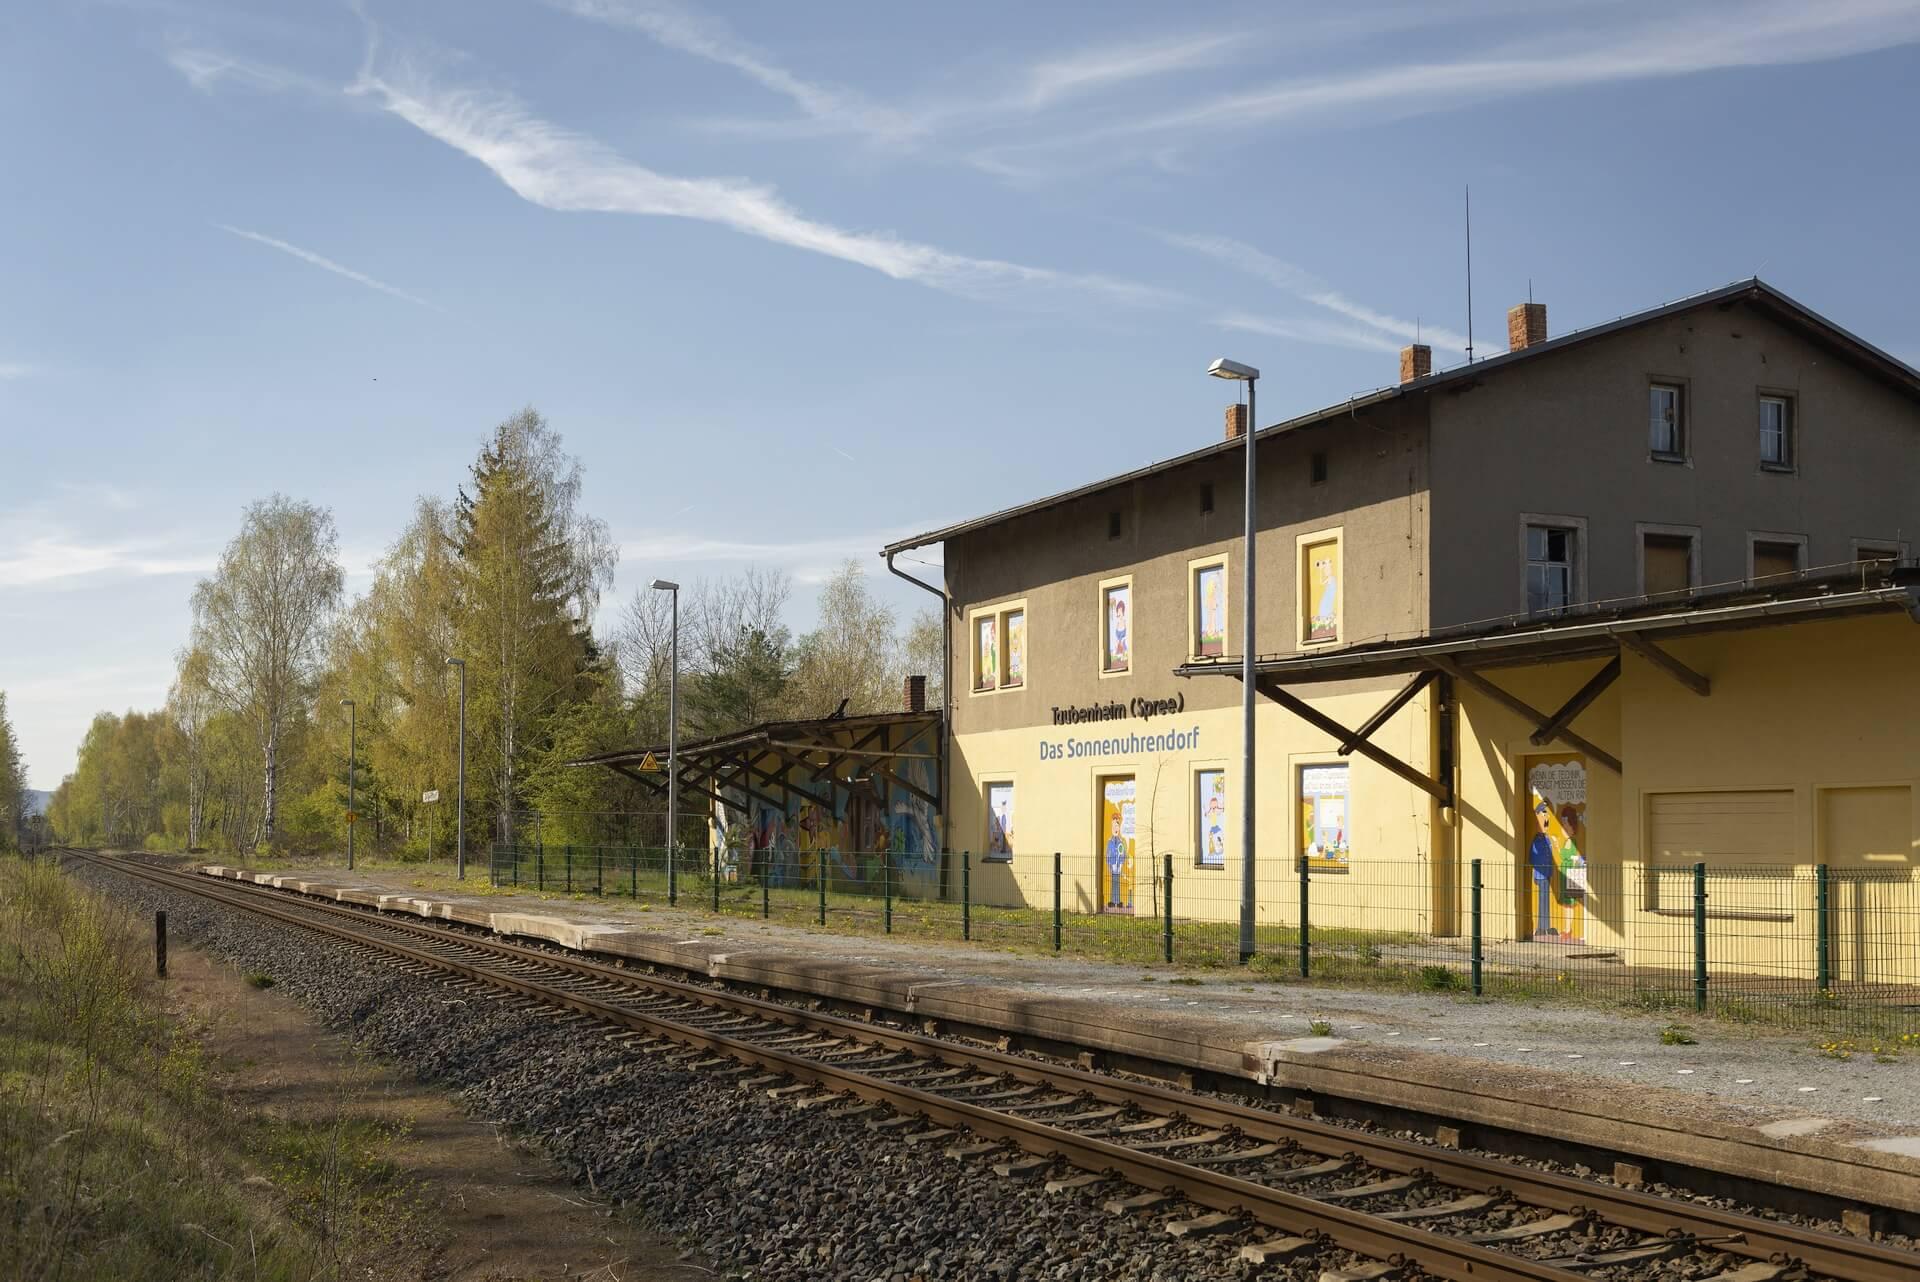 Bahnhof Taubenheim (Spree)